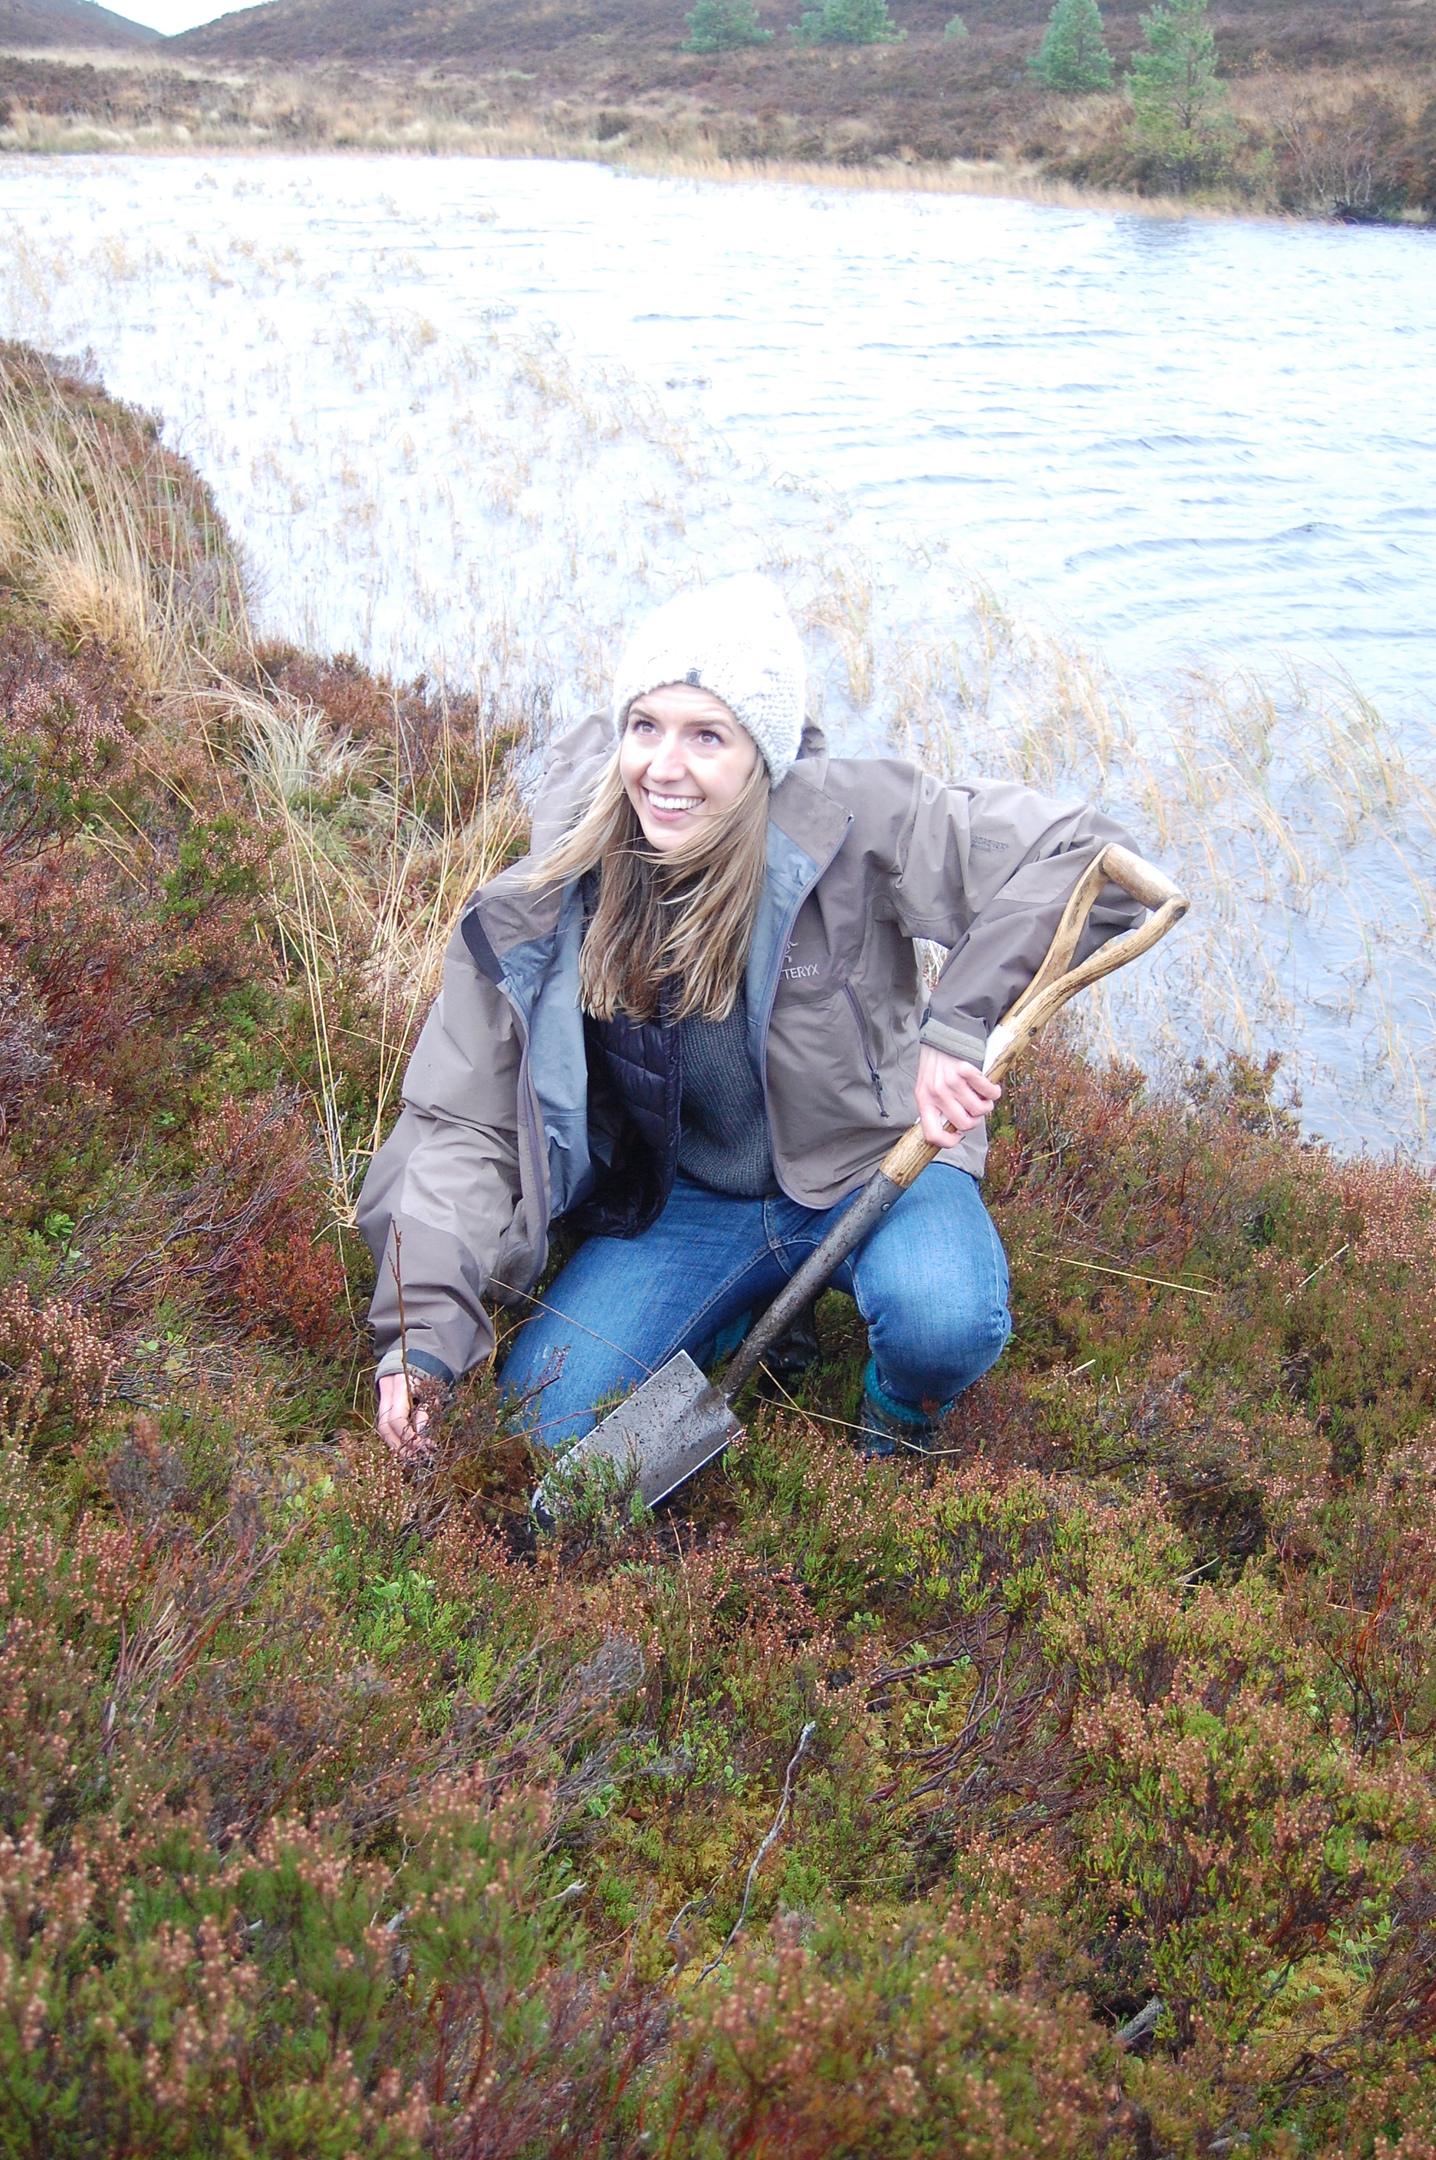 Jacqui Walker planting an aspen tree at Abernethy nature reserve